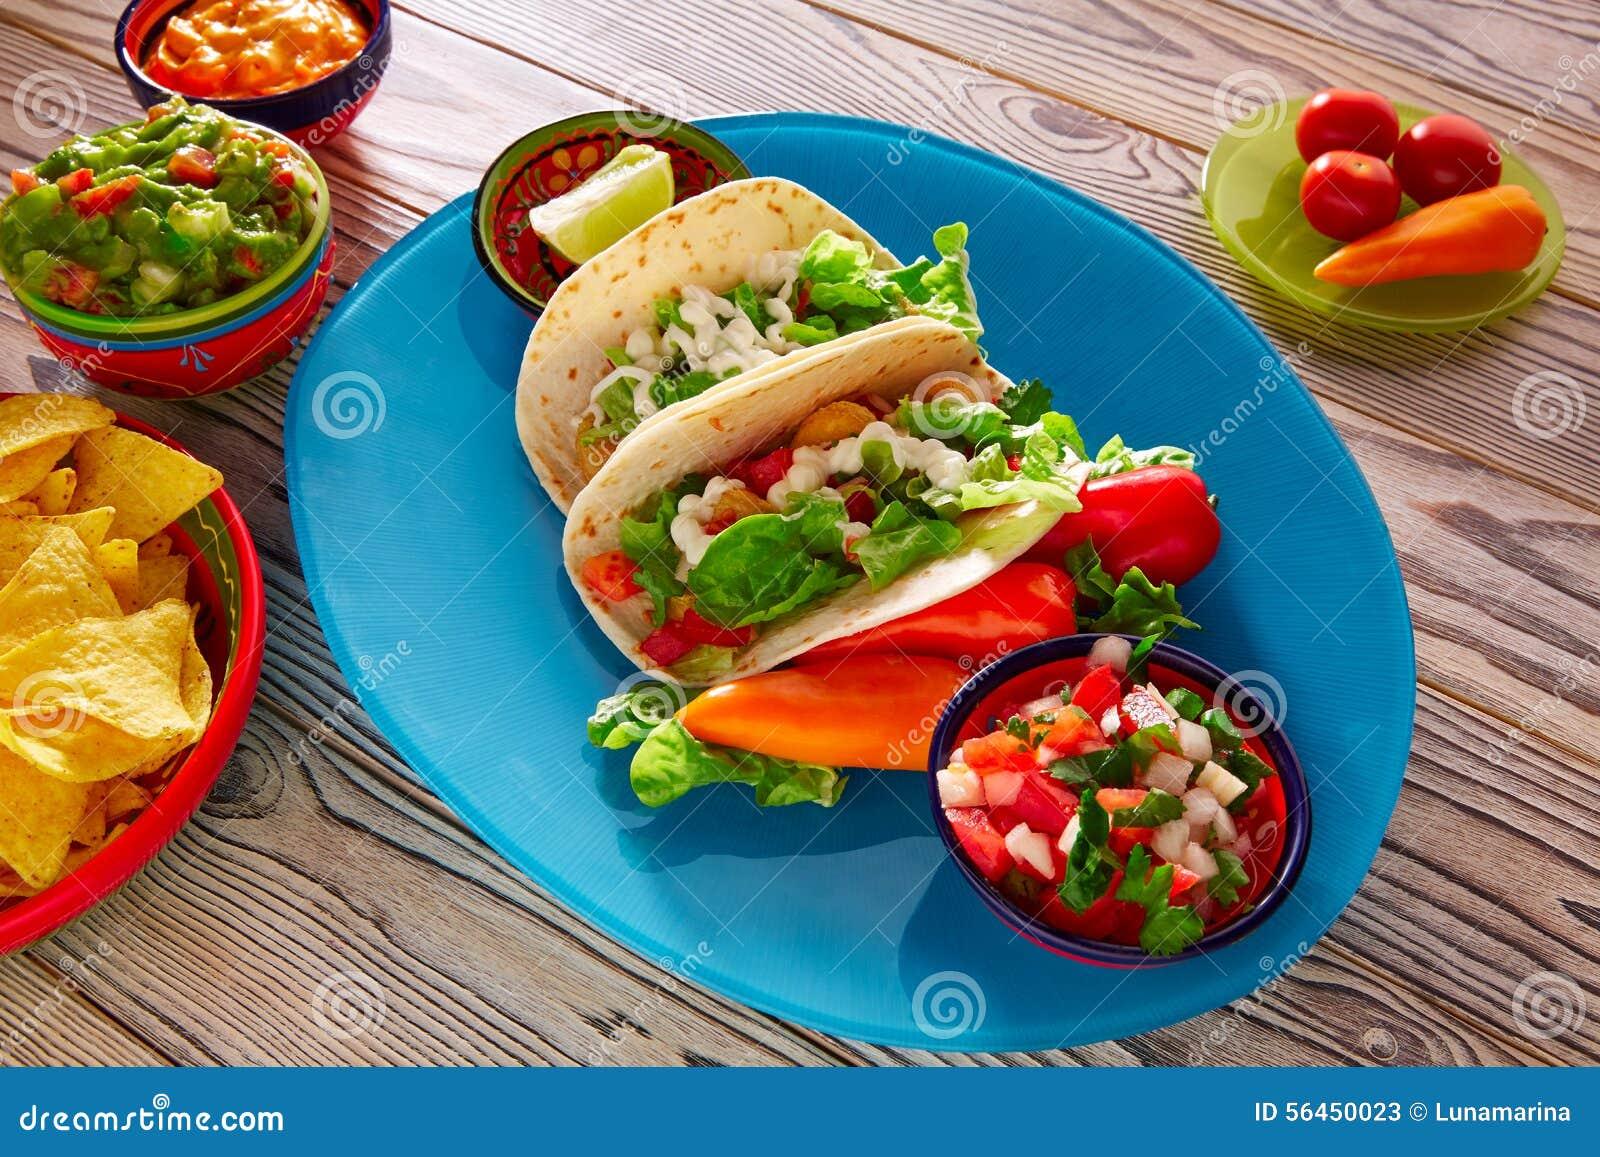 Fish Tacos Mexican Food Guacamole Nachos And Chili Stock Photo - Image ...